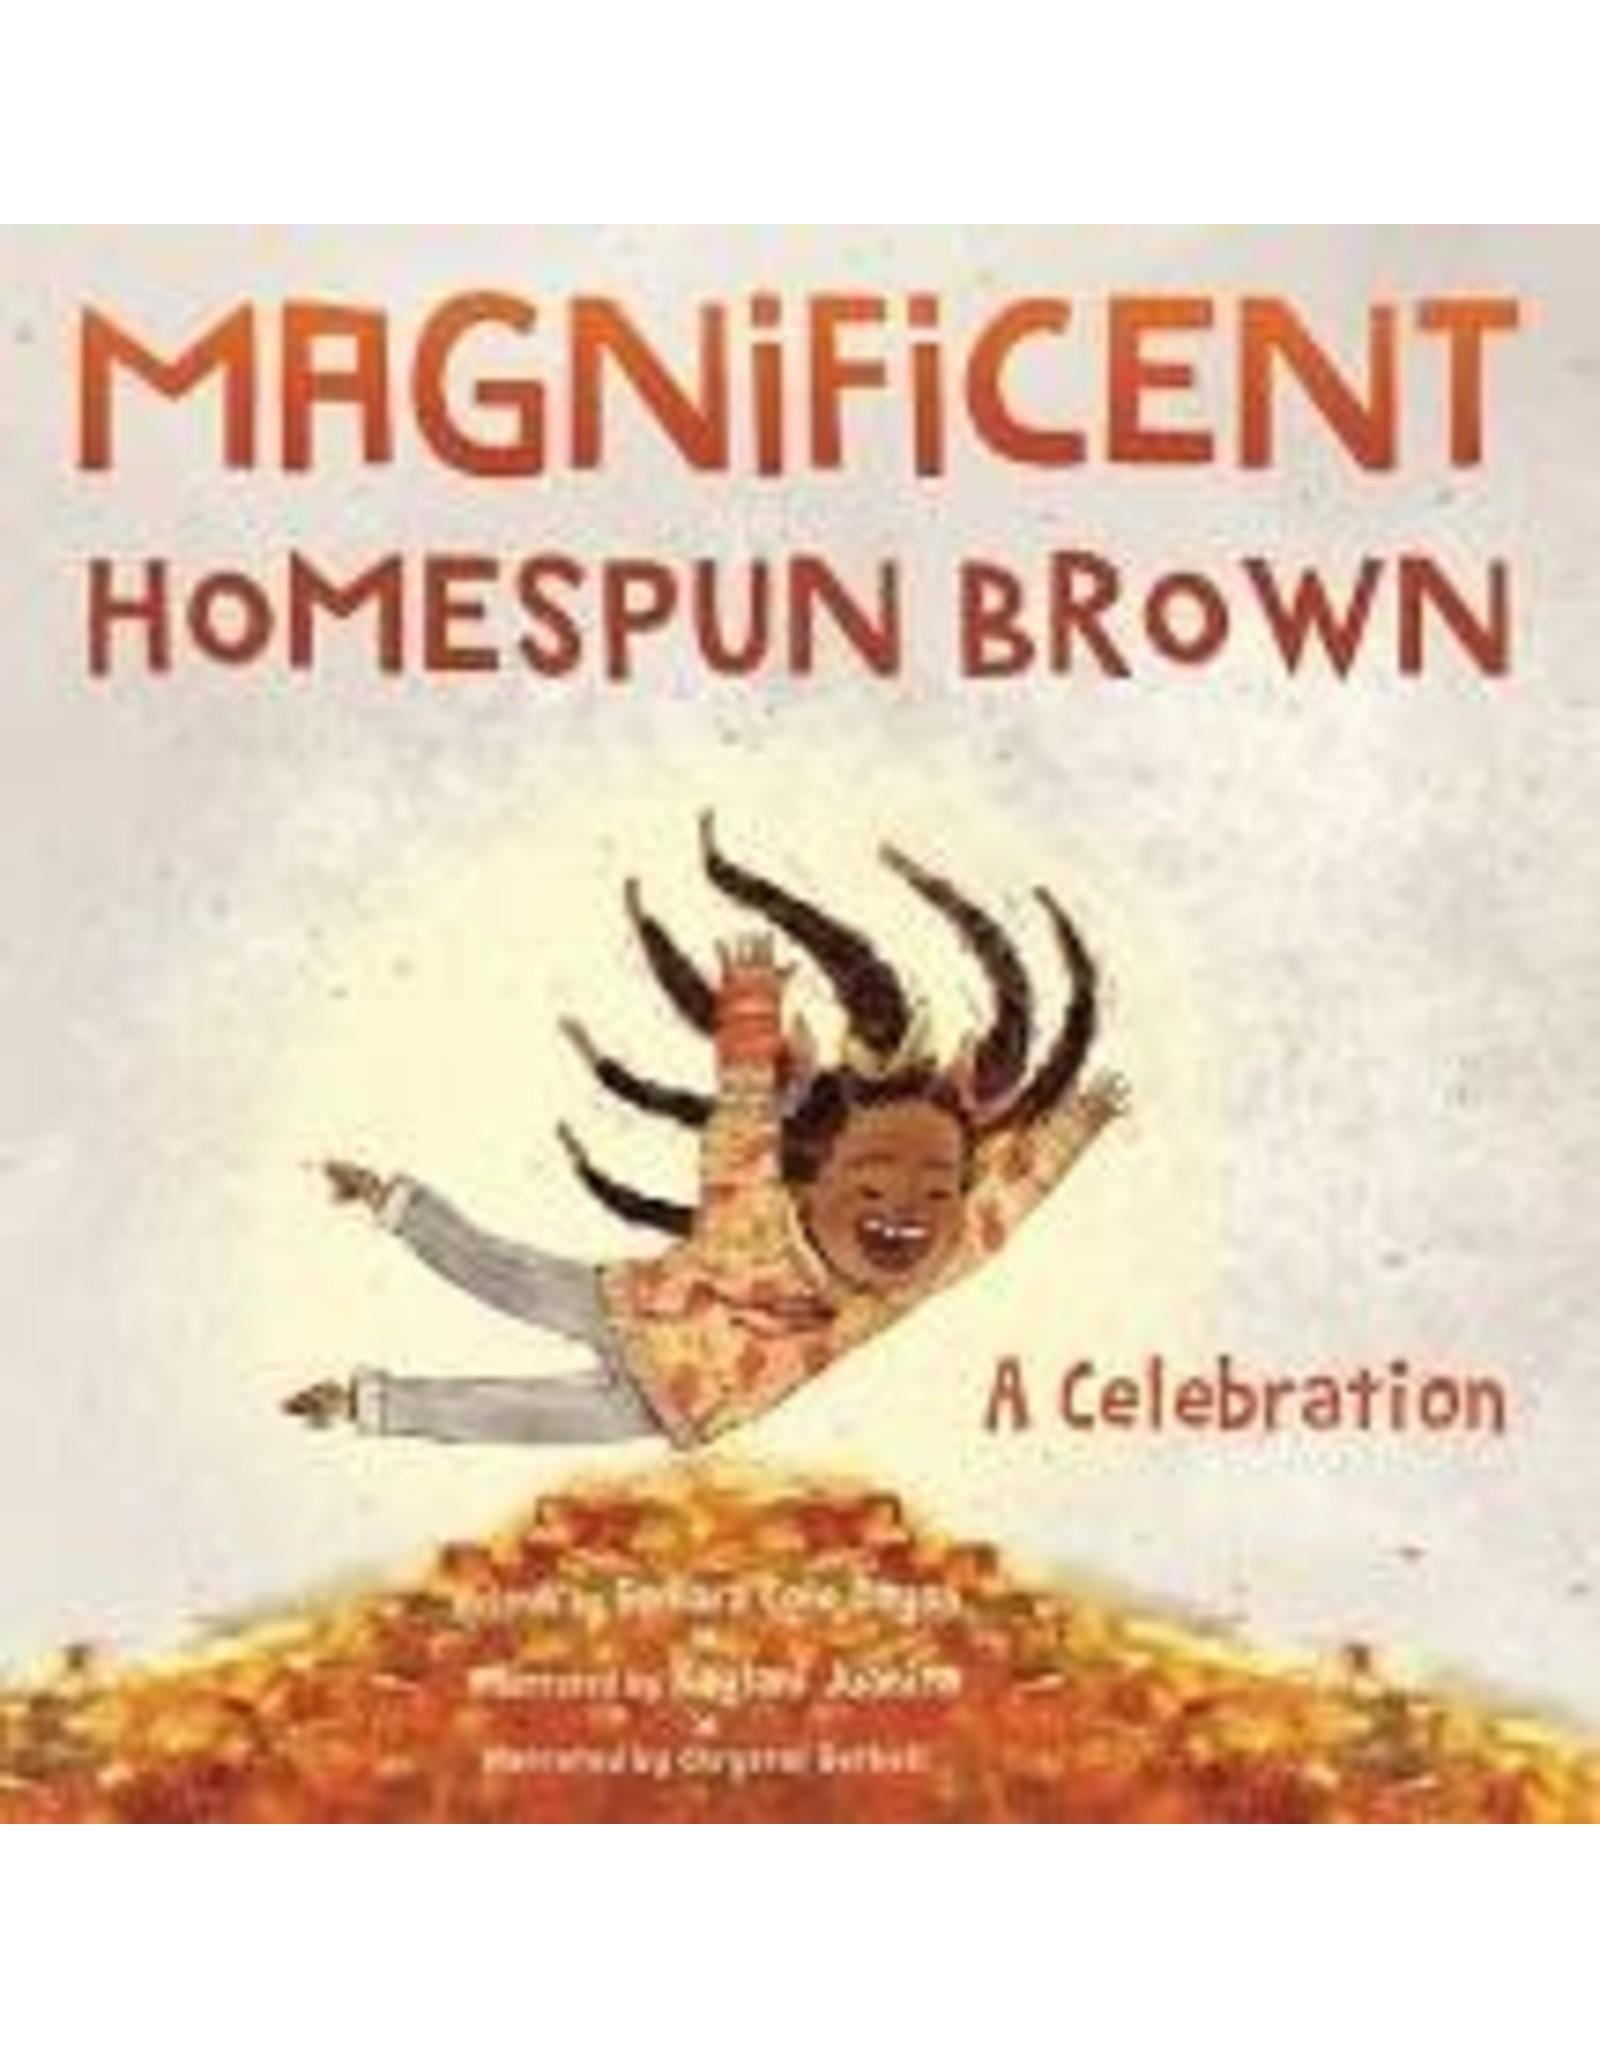 Books Magnificent Homespun Brown by Samara Cole Doyon (DWS)